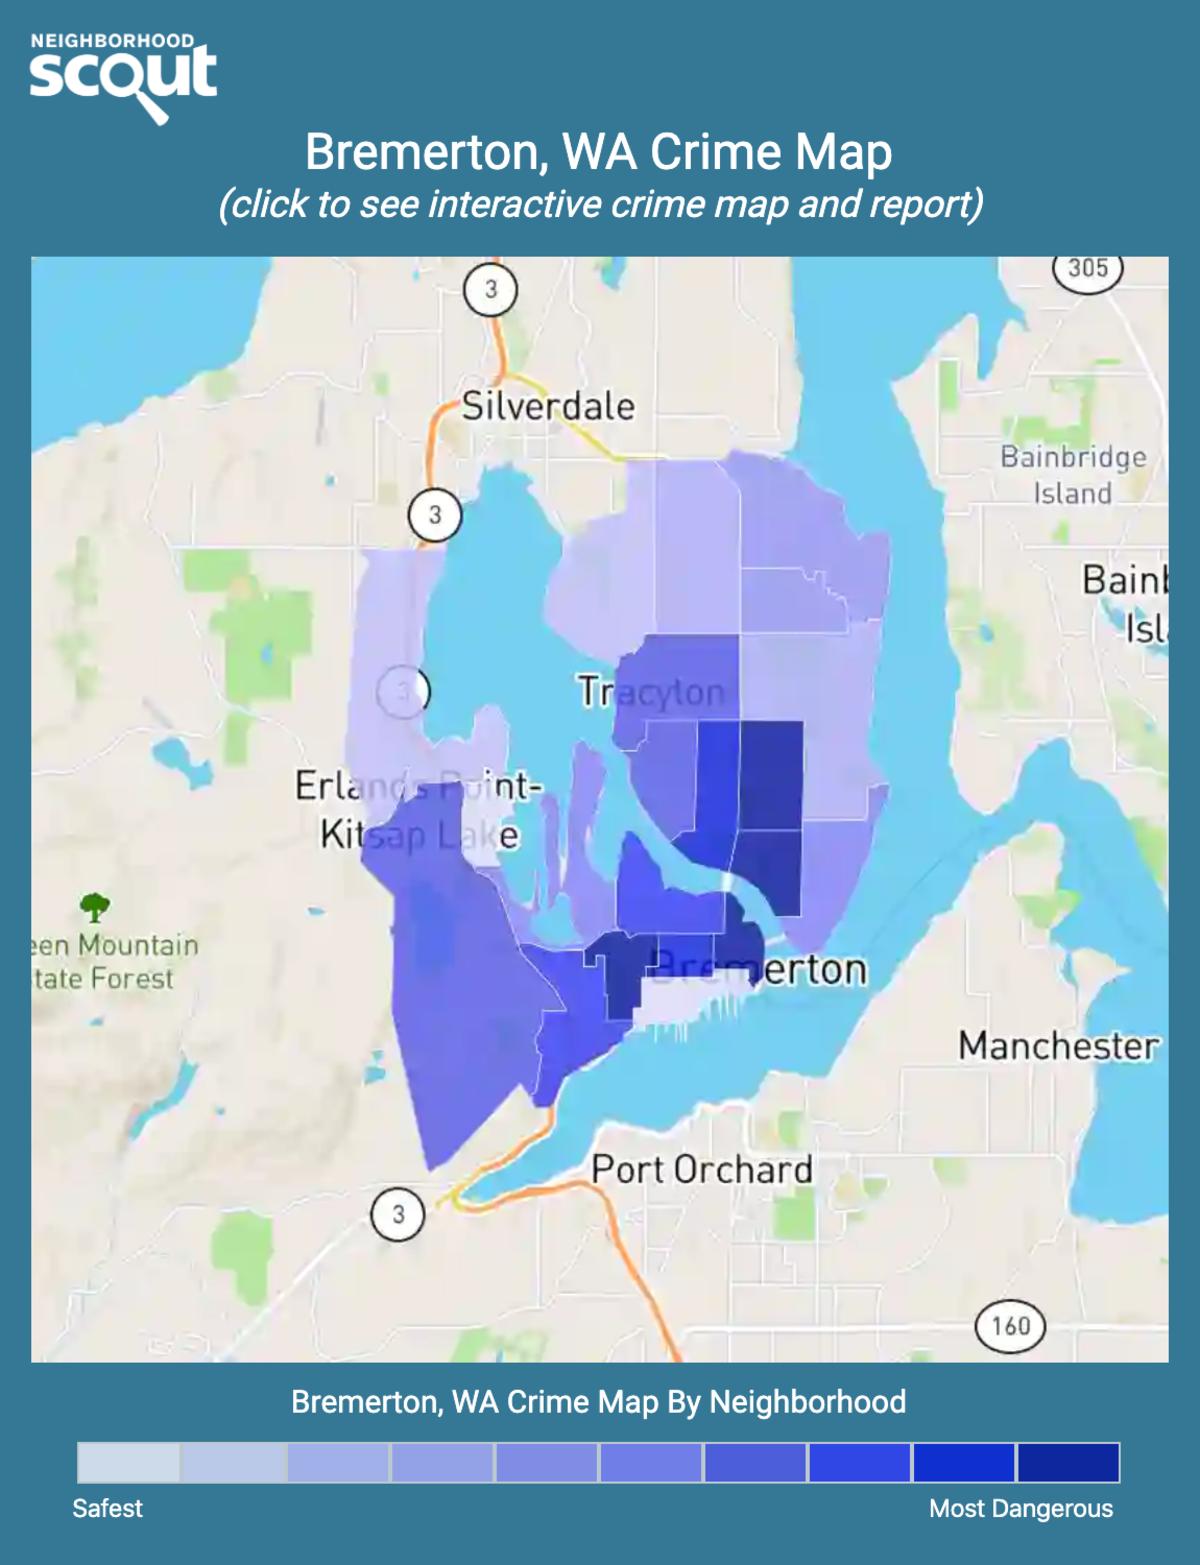 Bremerton, Washington crime map